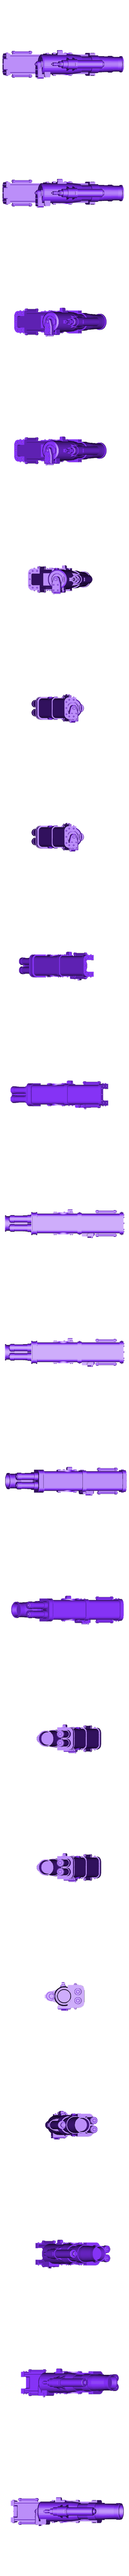 Artillery_Gun_Breech_Sized.stl Download free STL file Catoblepas SPG • 3D printable design, nfeyma